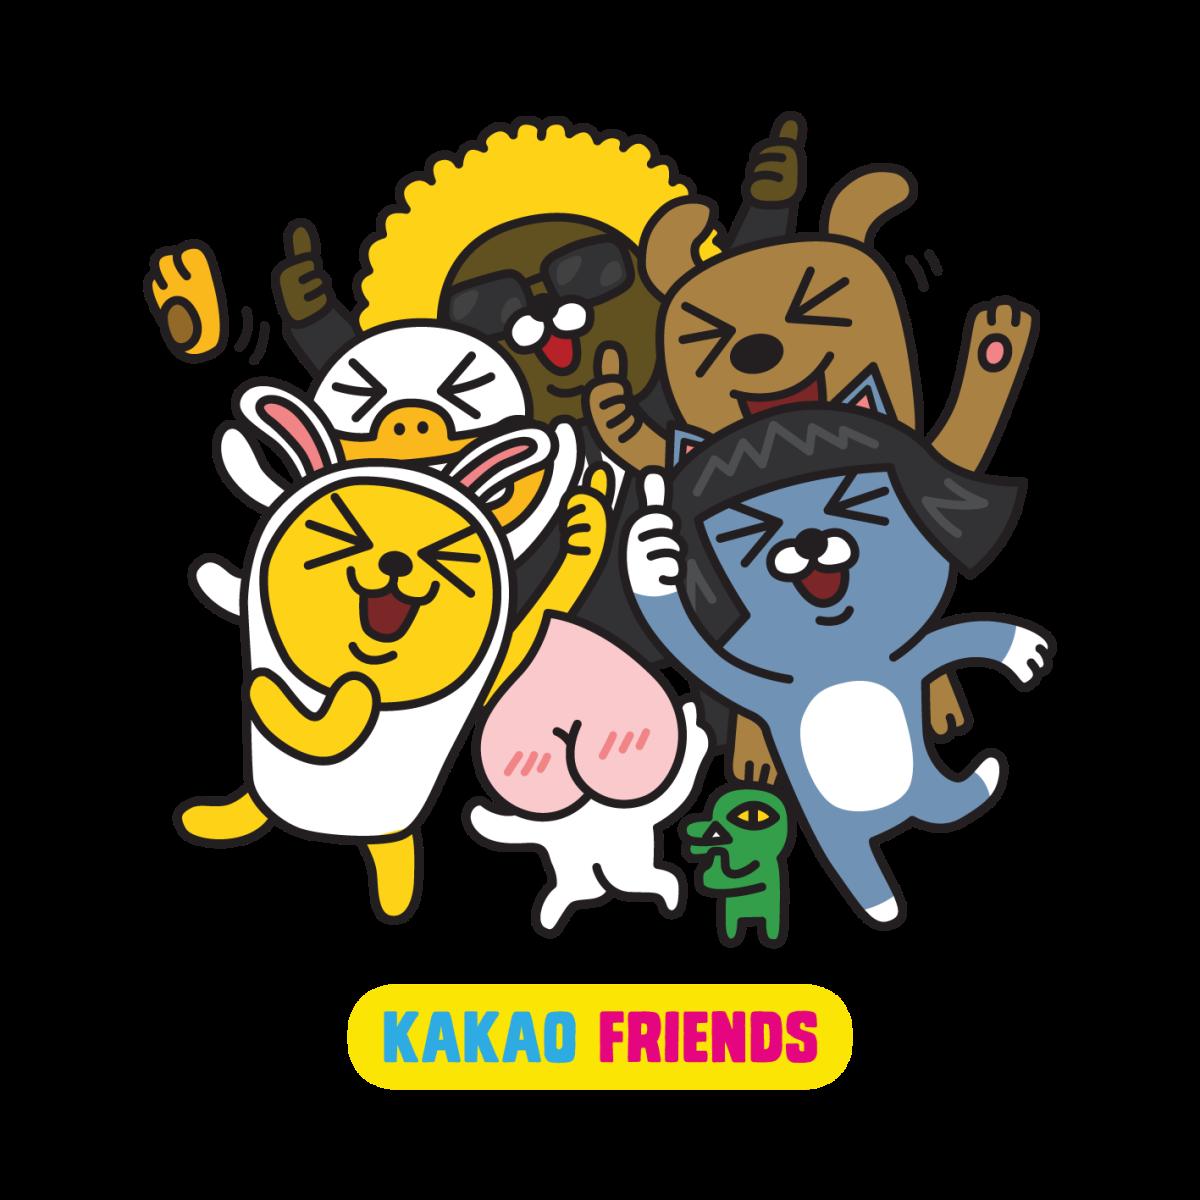 Happy KakaoTalk with Kakao Friends